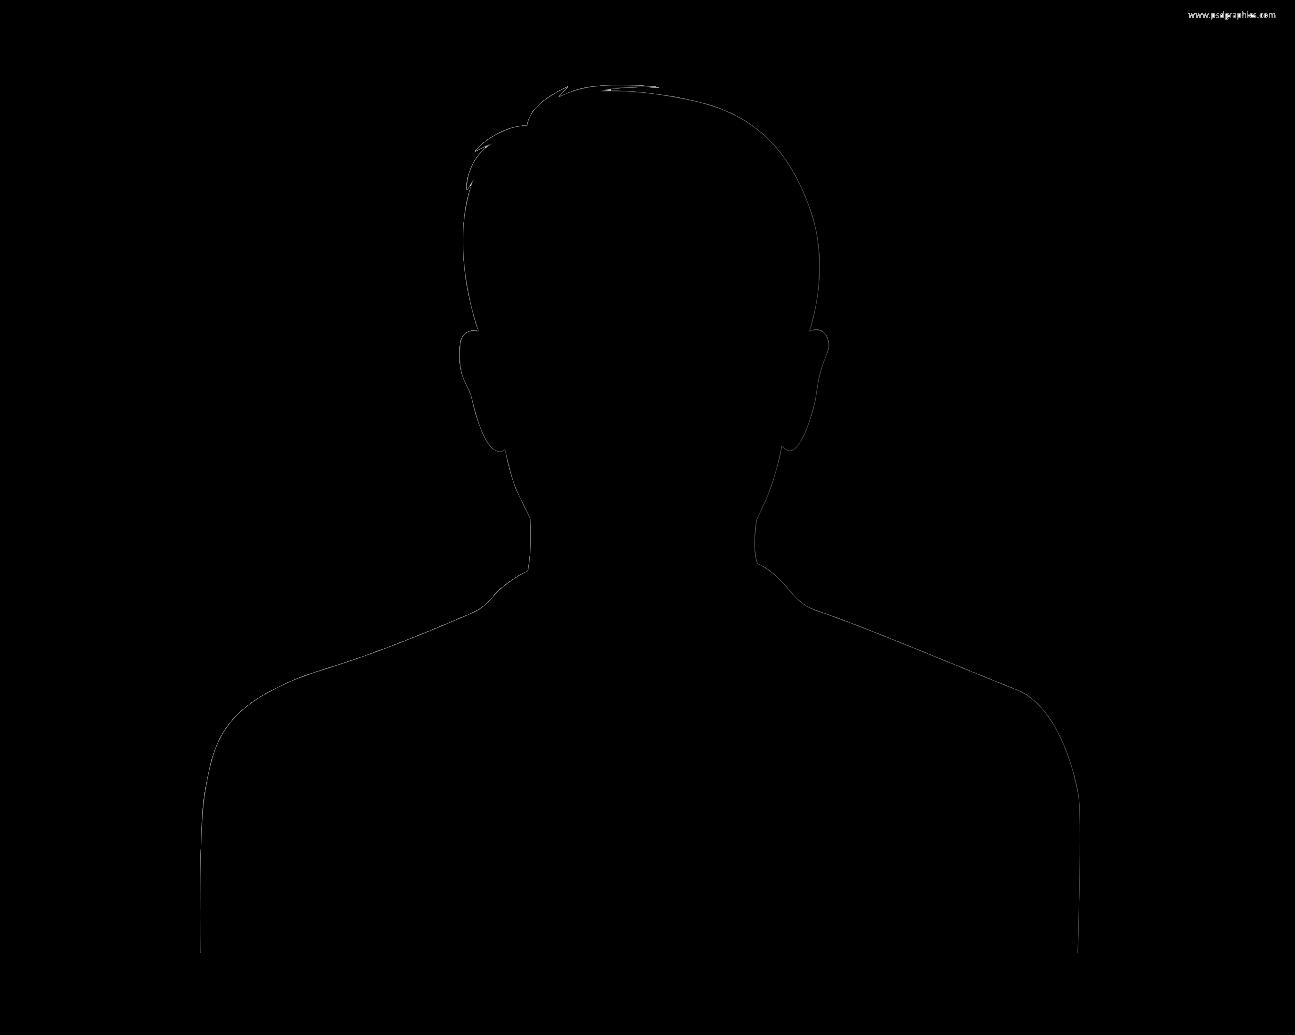 1295x1035 Silhouette Shadow Kansas City Hvac Company